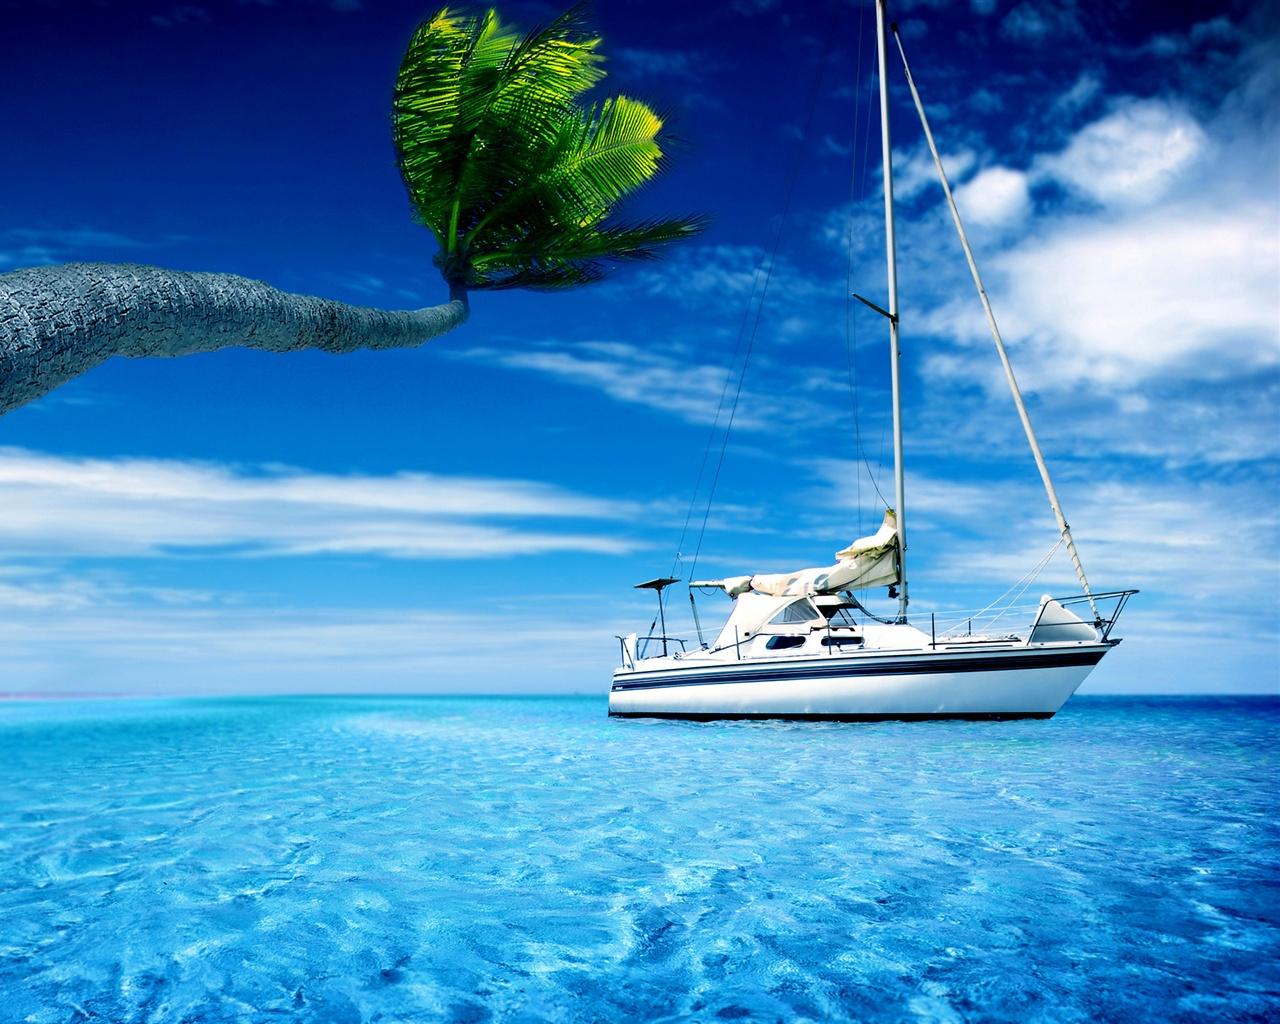 Wallpaper Boat, Sea Water, Palm Tree, Hot Summer Sky